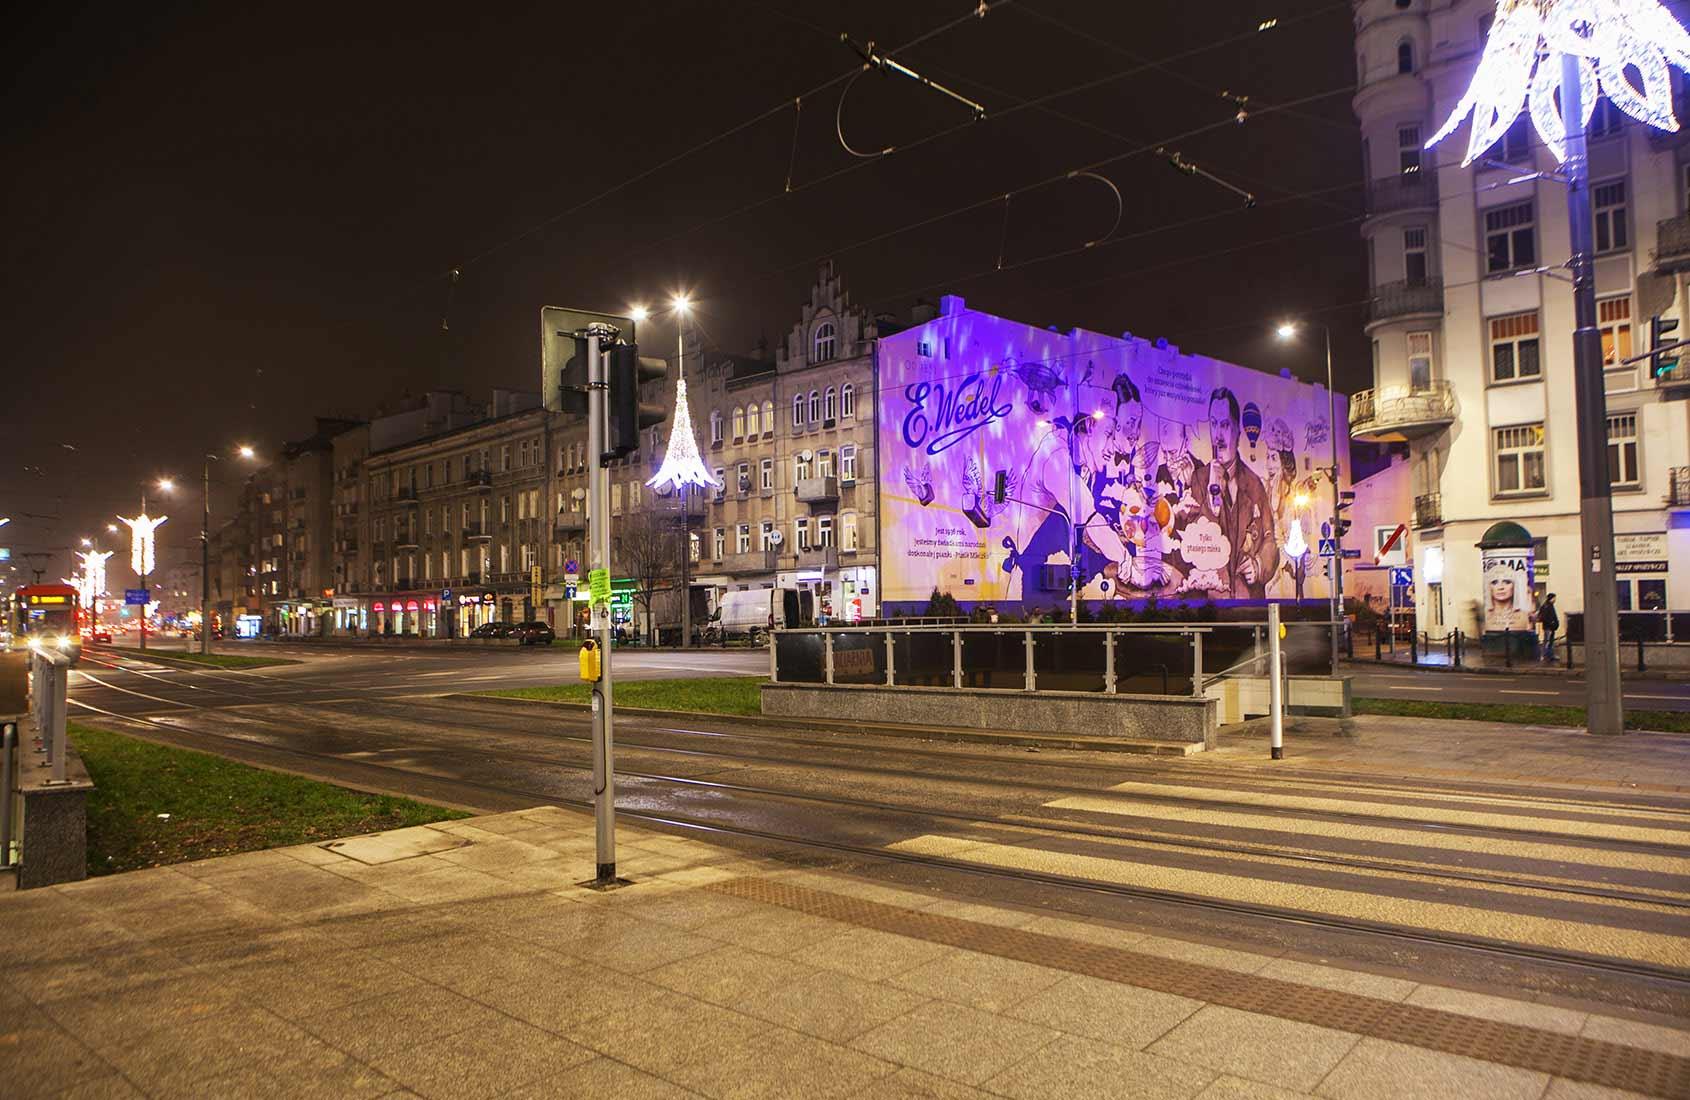 Ptasie Mleczko Iluminacja mural IDEAMO Wedel Warszawa